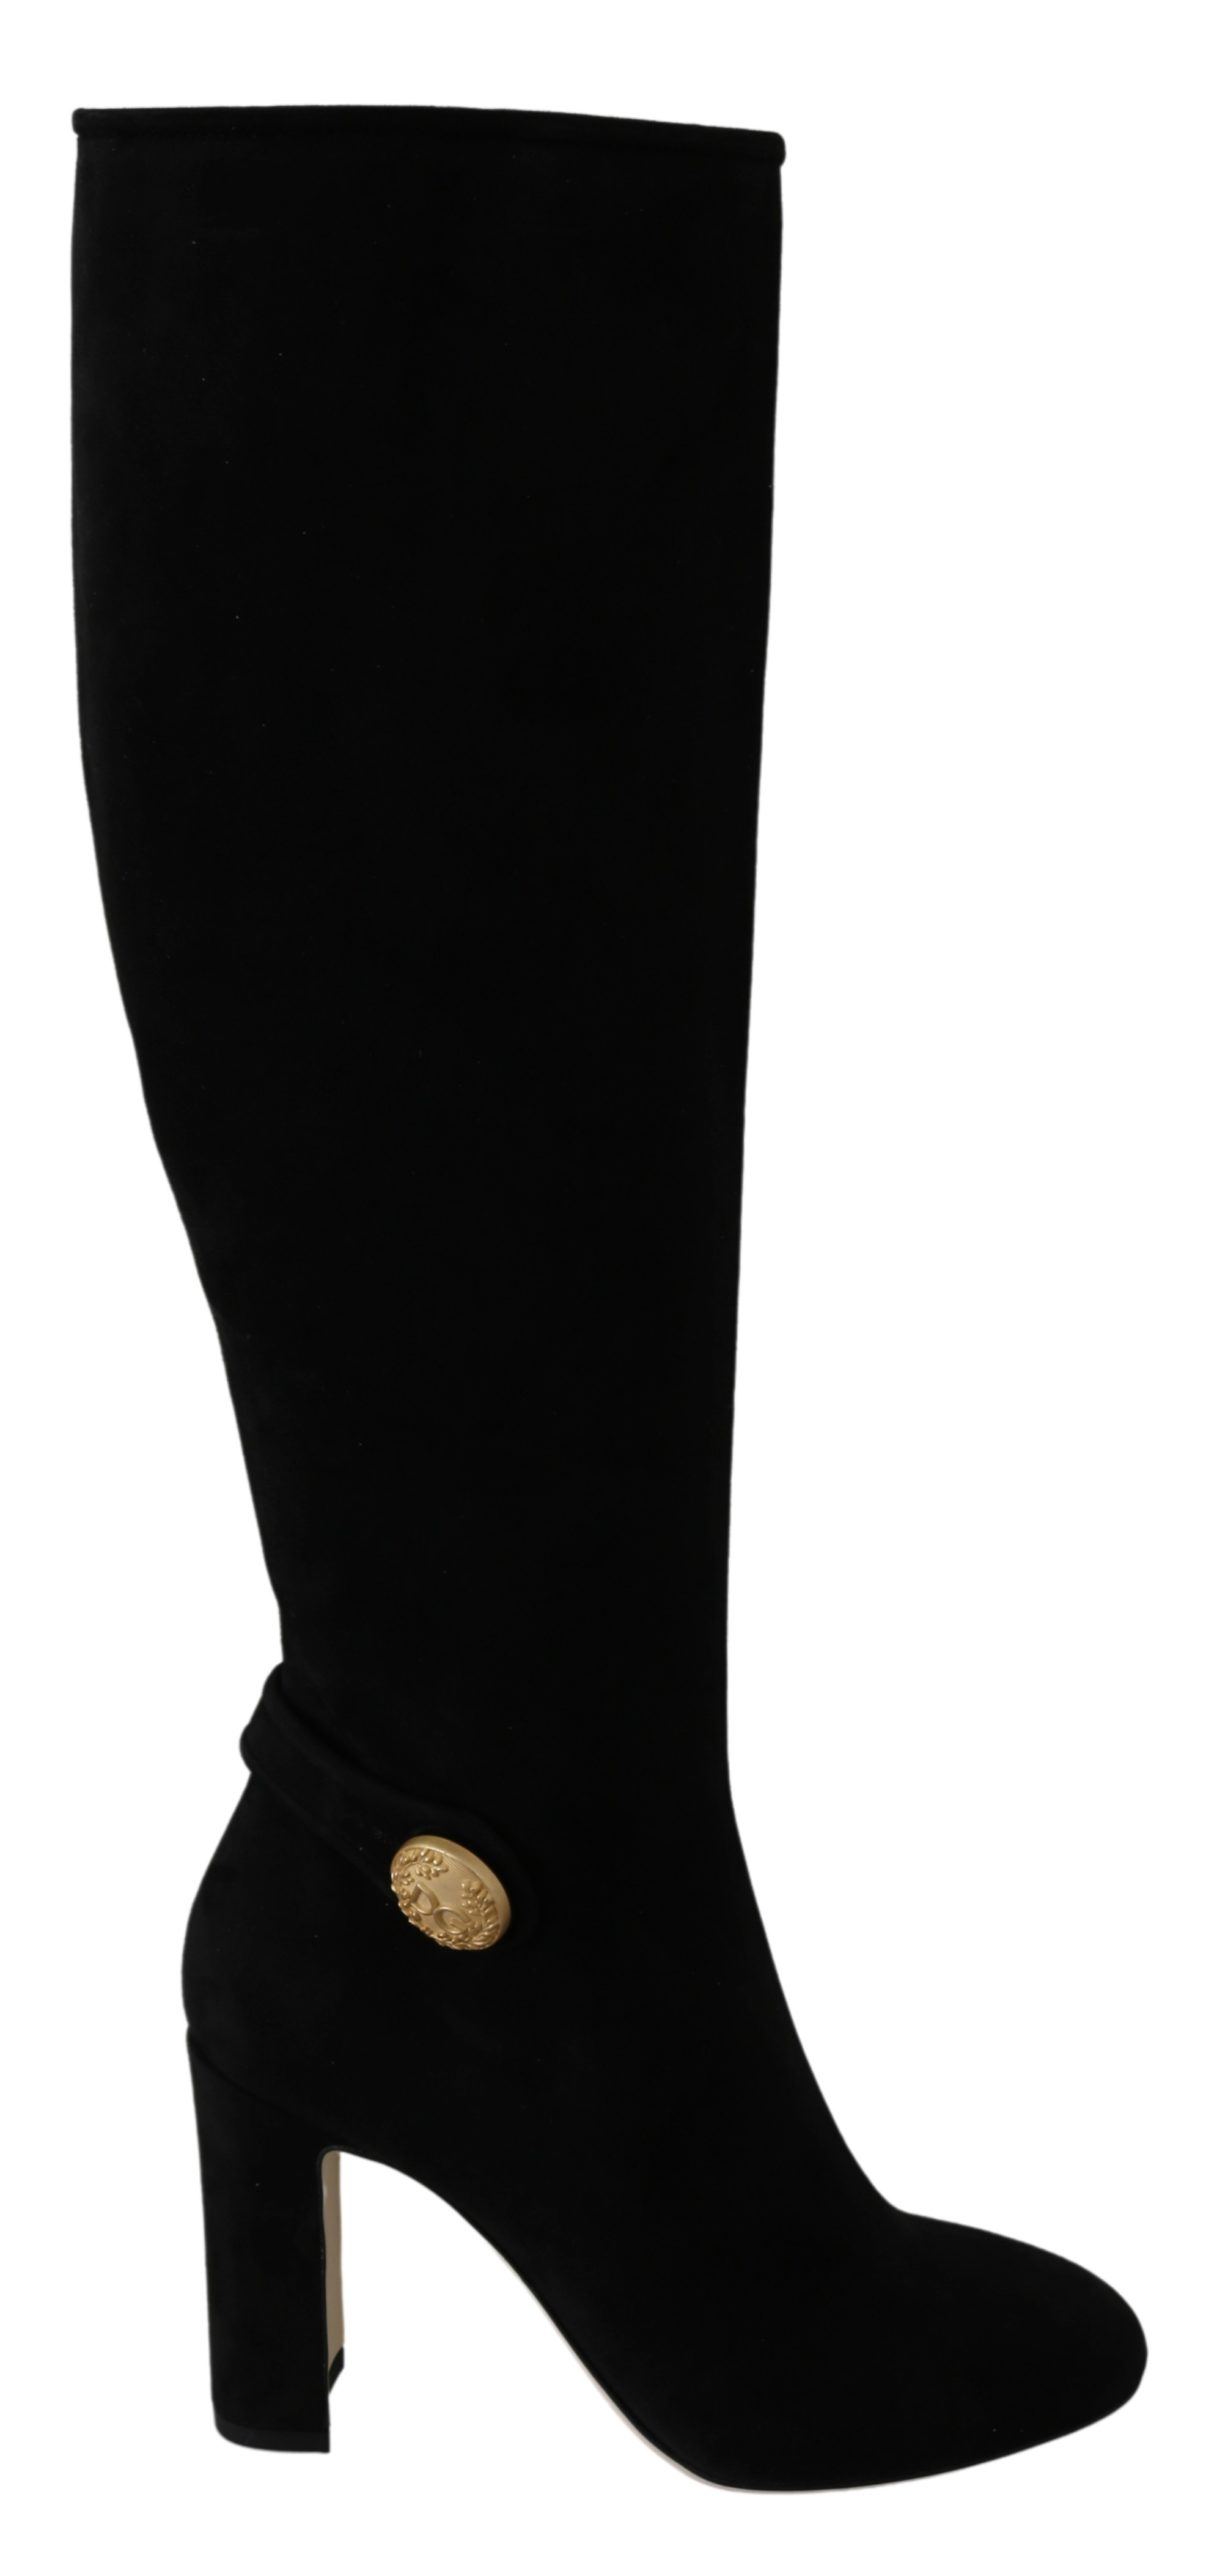 Dolce & Gabbana Women's Suede Logo Knee Boots Black LA6400 - EU38/US7.5